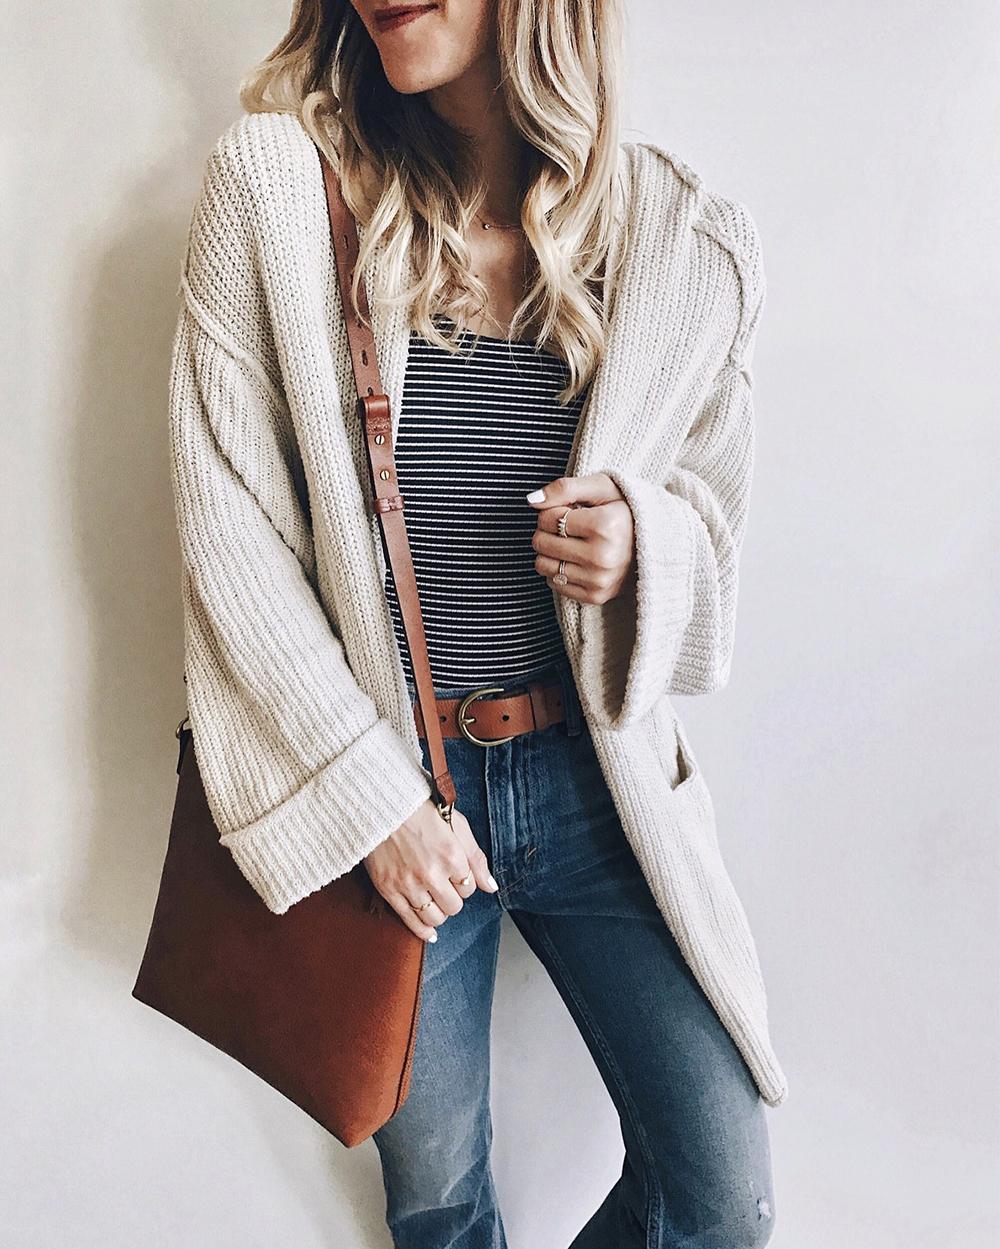 livvyland-blog-olivia-watson-instagram-roundup-livvylandblog-cozy-chic-boho-outfit-idea-7